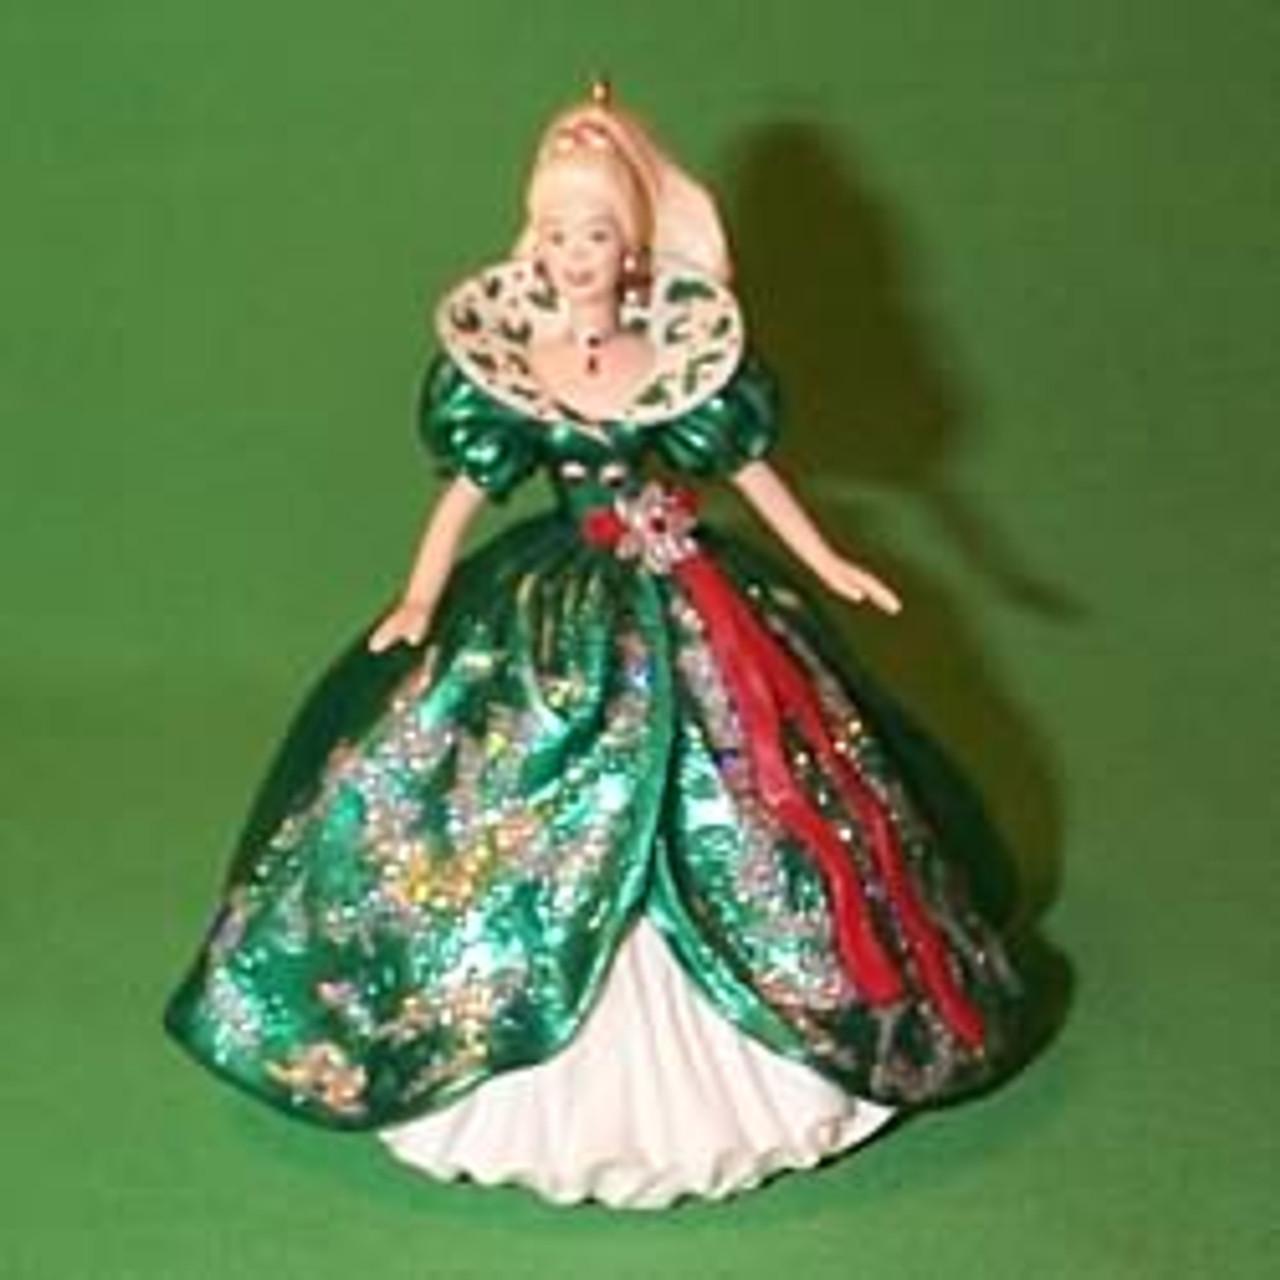 Barbie Christmas Ornament.1995 Barbie Holiday 3